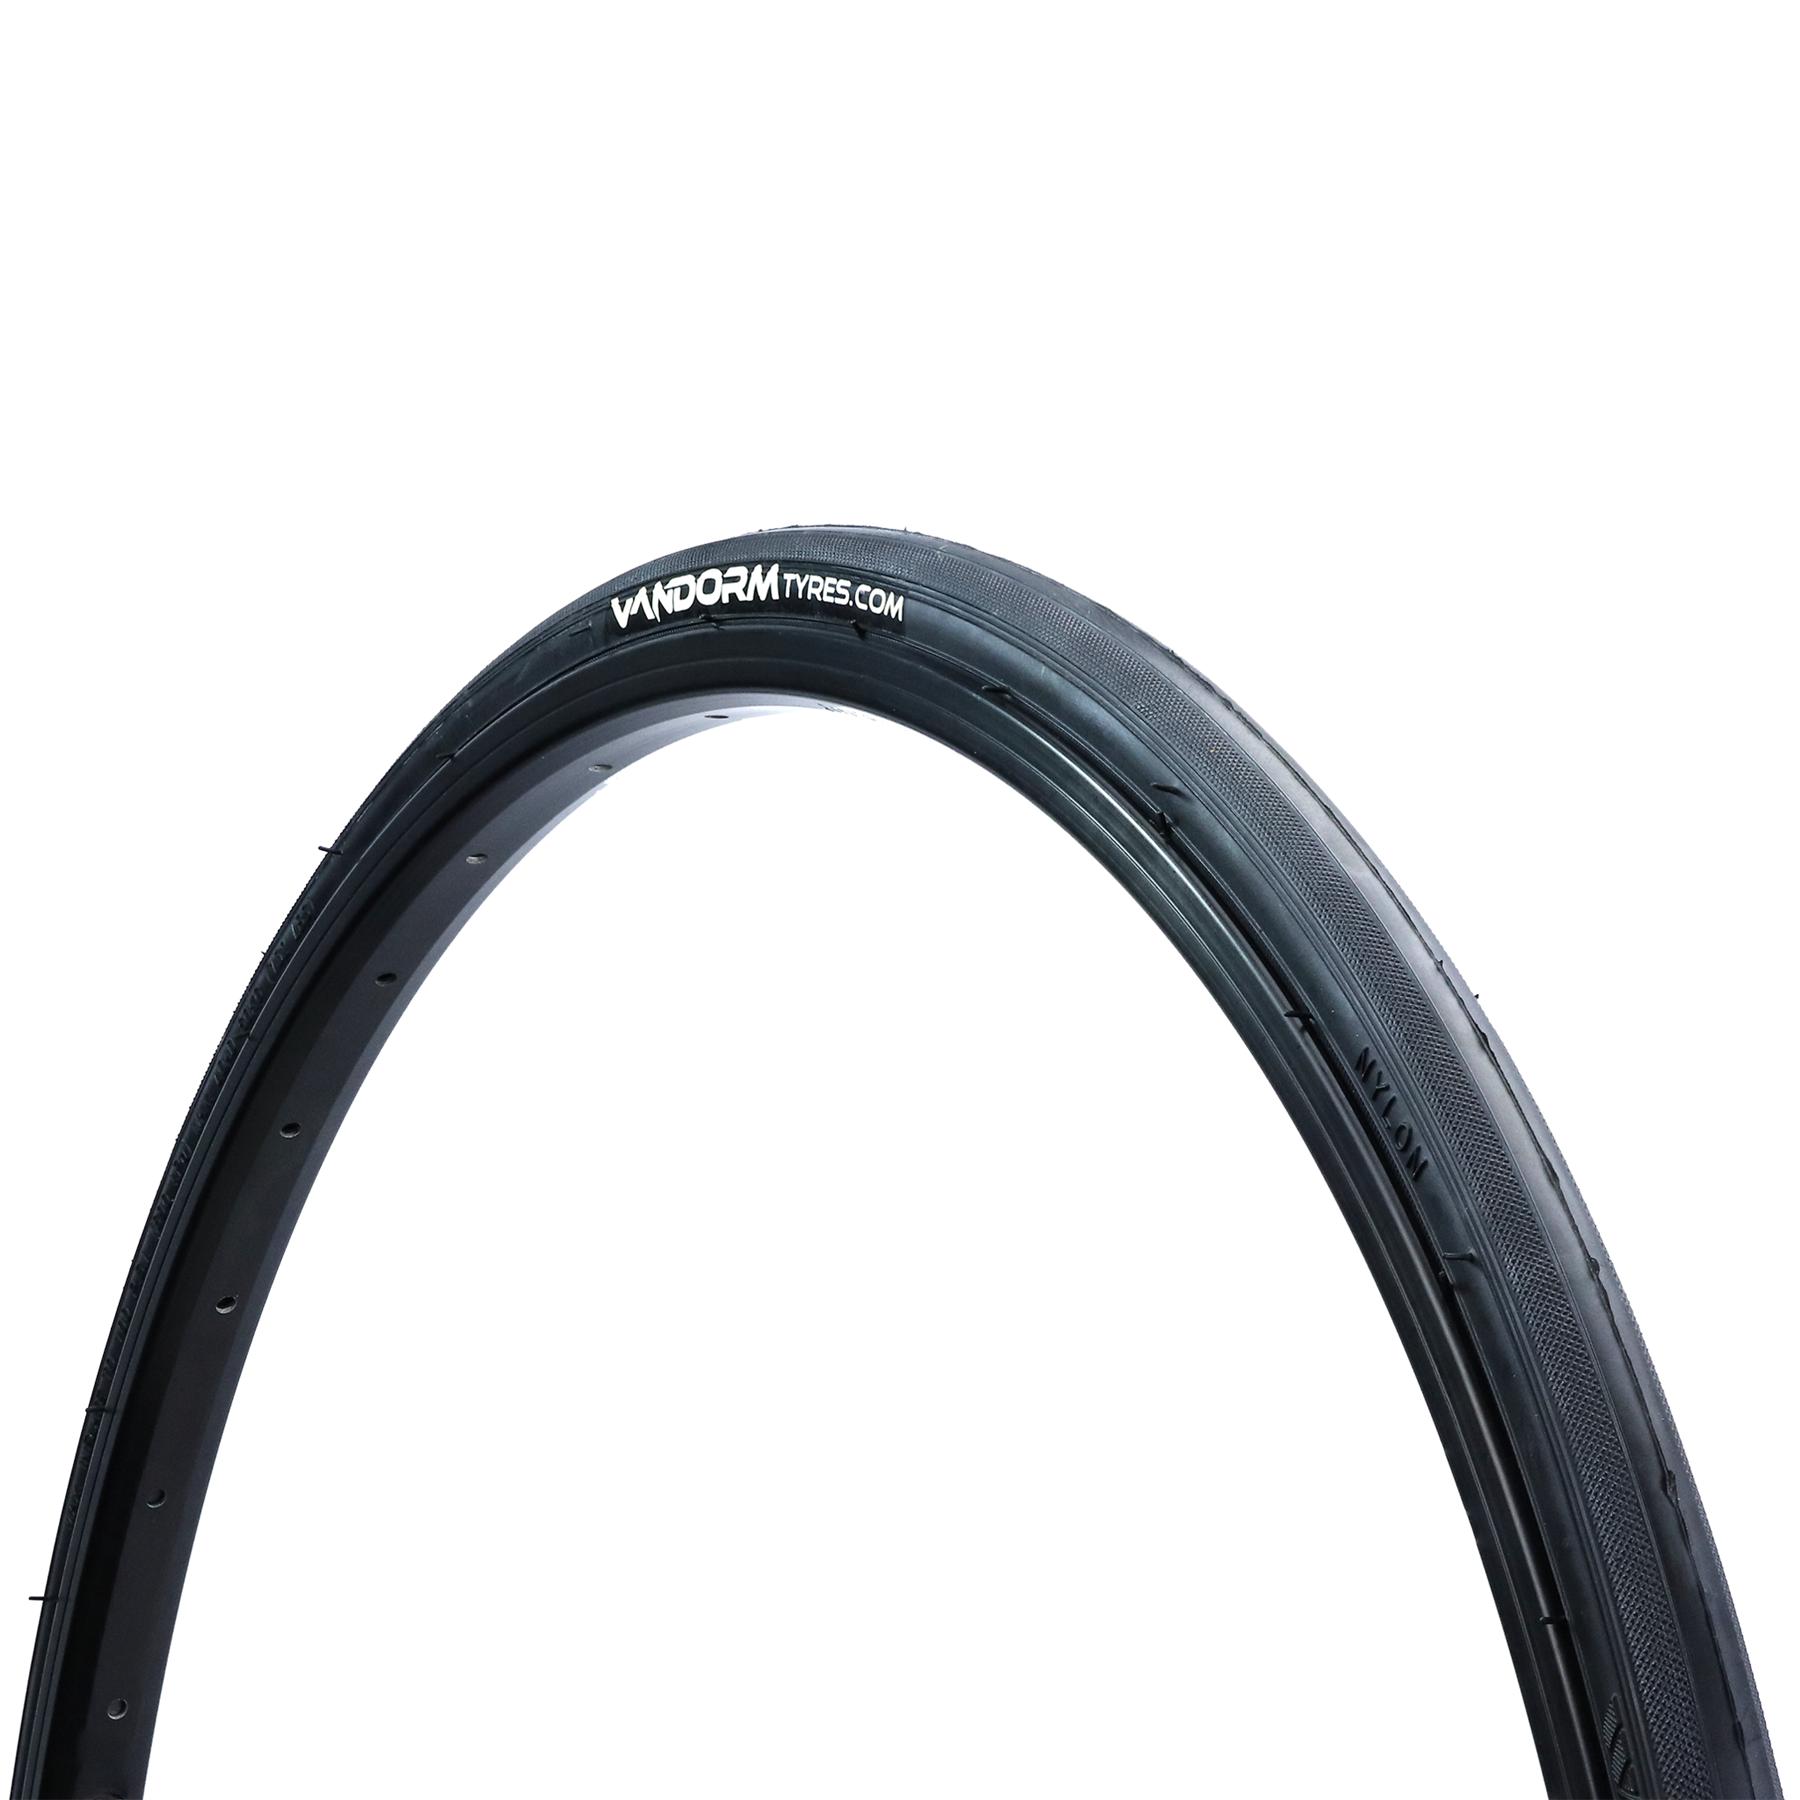 miniatuur 4 - Vandorm 700 x 23c SPEED 3 Colour Road Bike Fixie Tyres & Tube DEAL OPTIONS